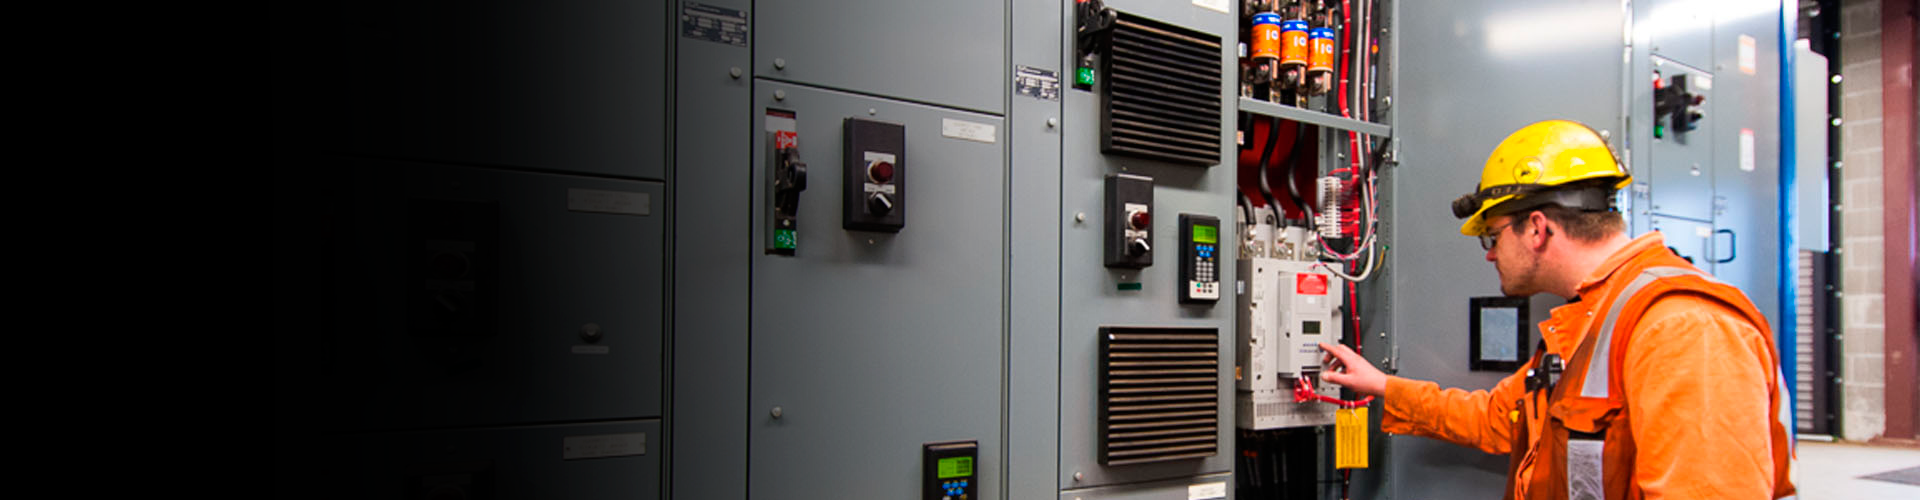 auditoria electrica lima alka soluciones tecnologicas